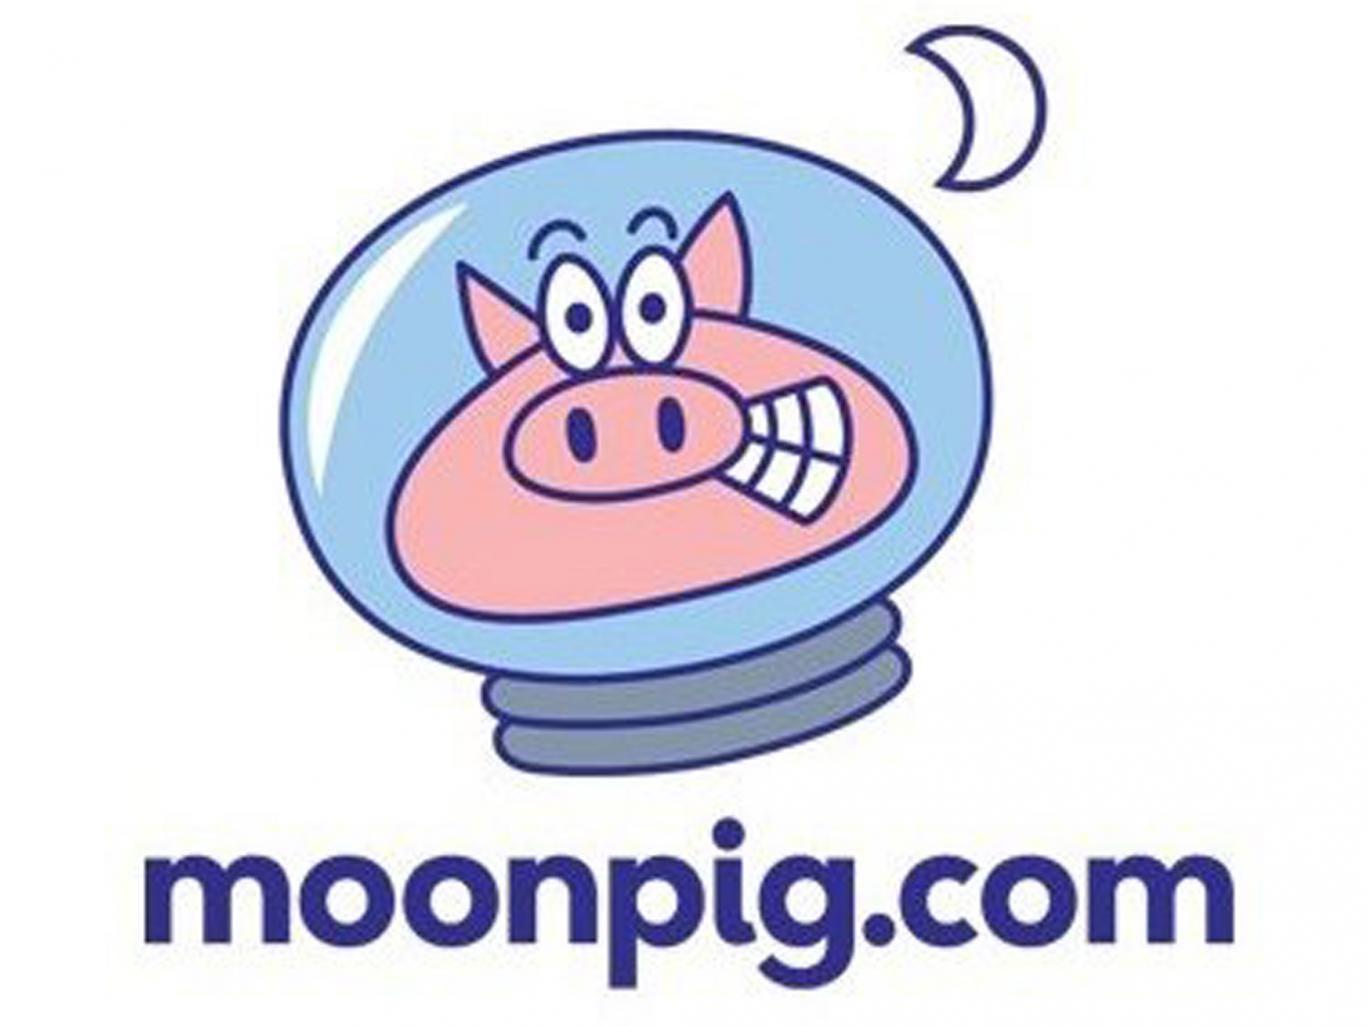 The Moonpig logo Moonpig